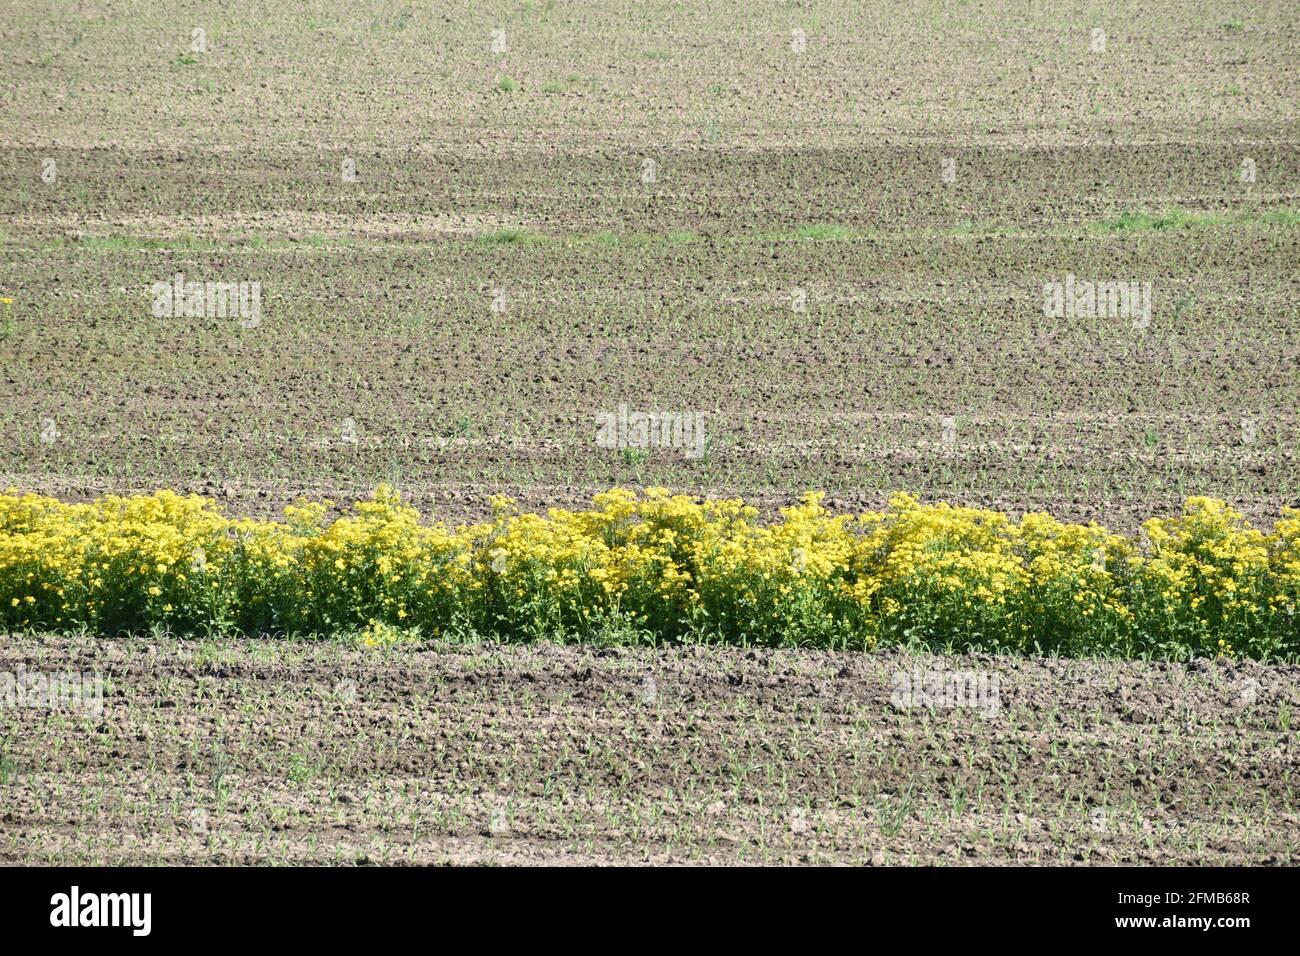 Wildflowers growing in corn field in spring Stock Photo